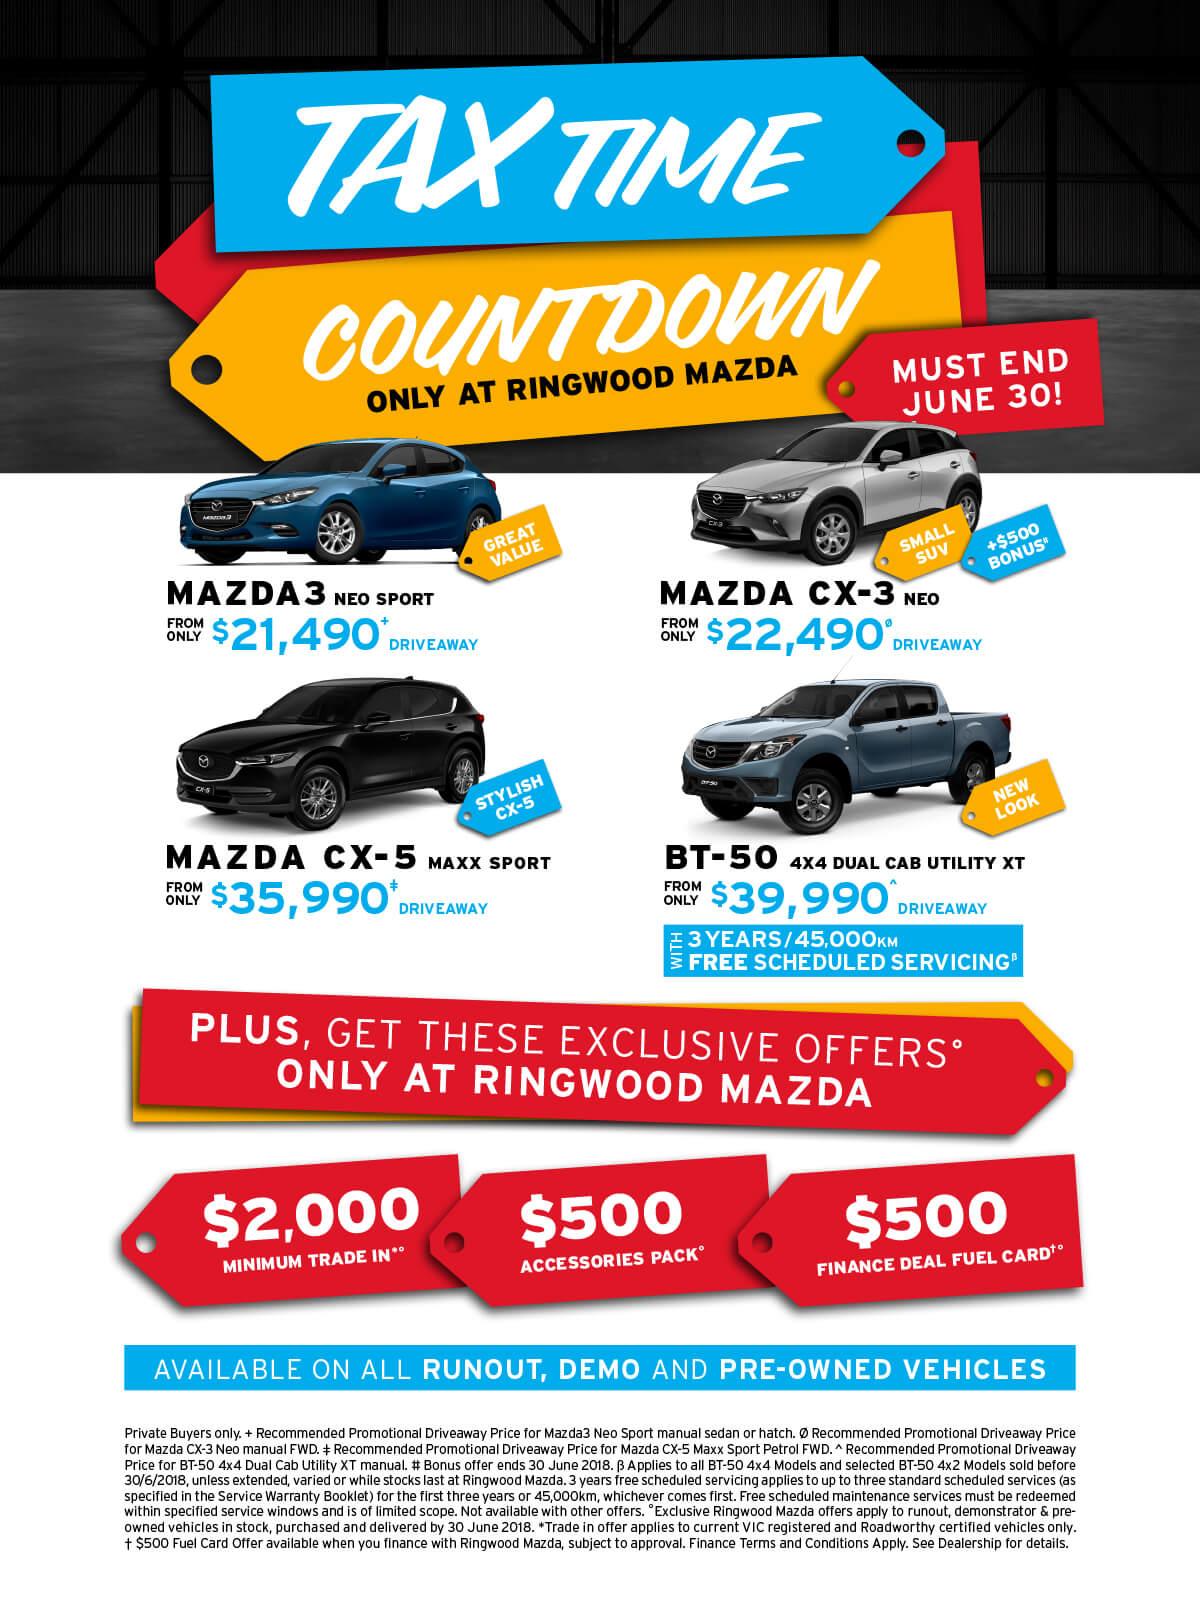 Ringwood Mazda May/June offer